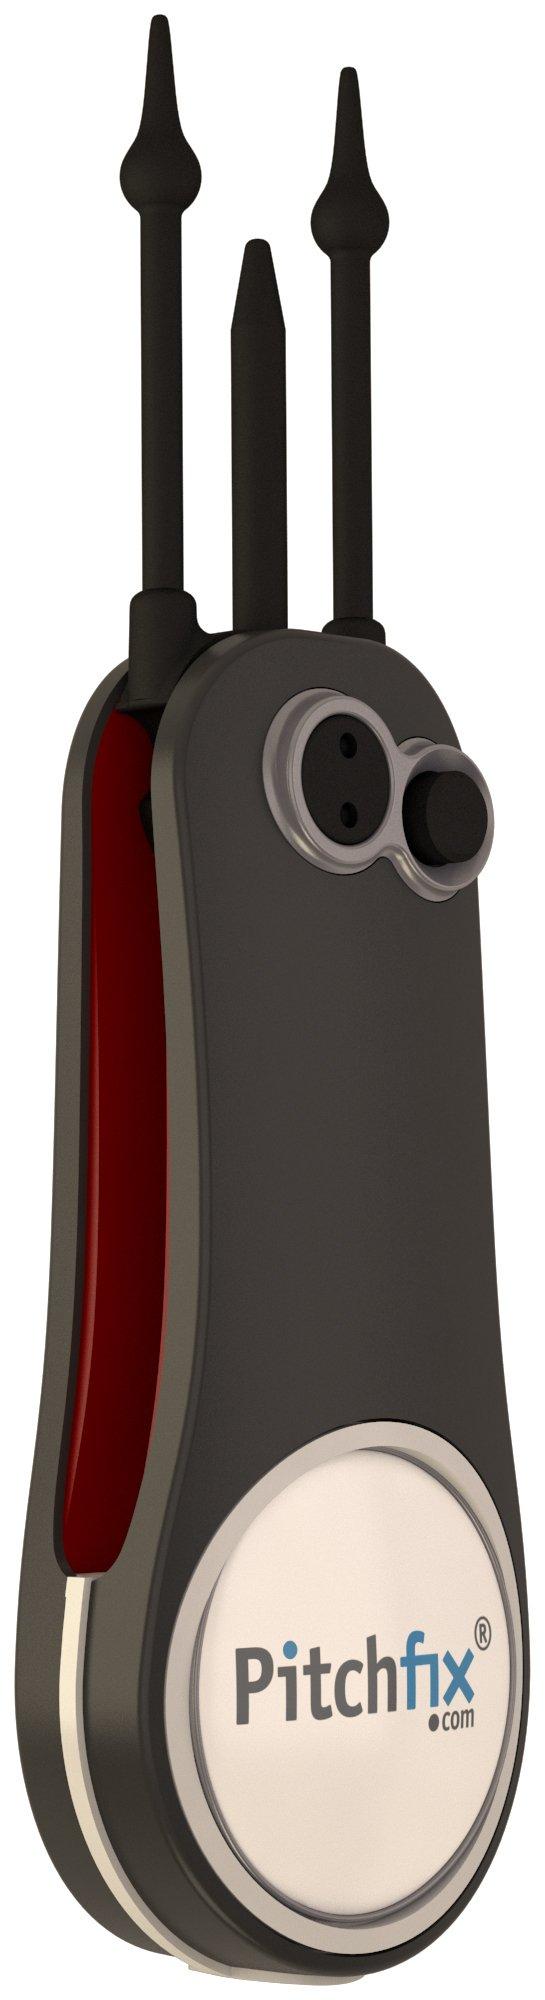 Pitchfix Fusion 2.5 Pin, Gun/Red by Pitchfix